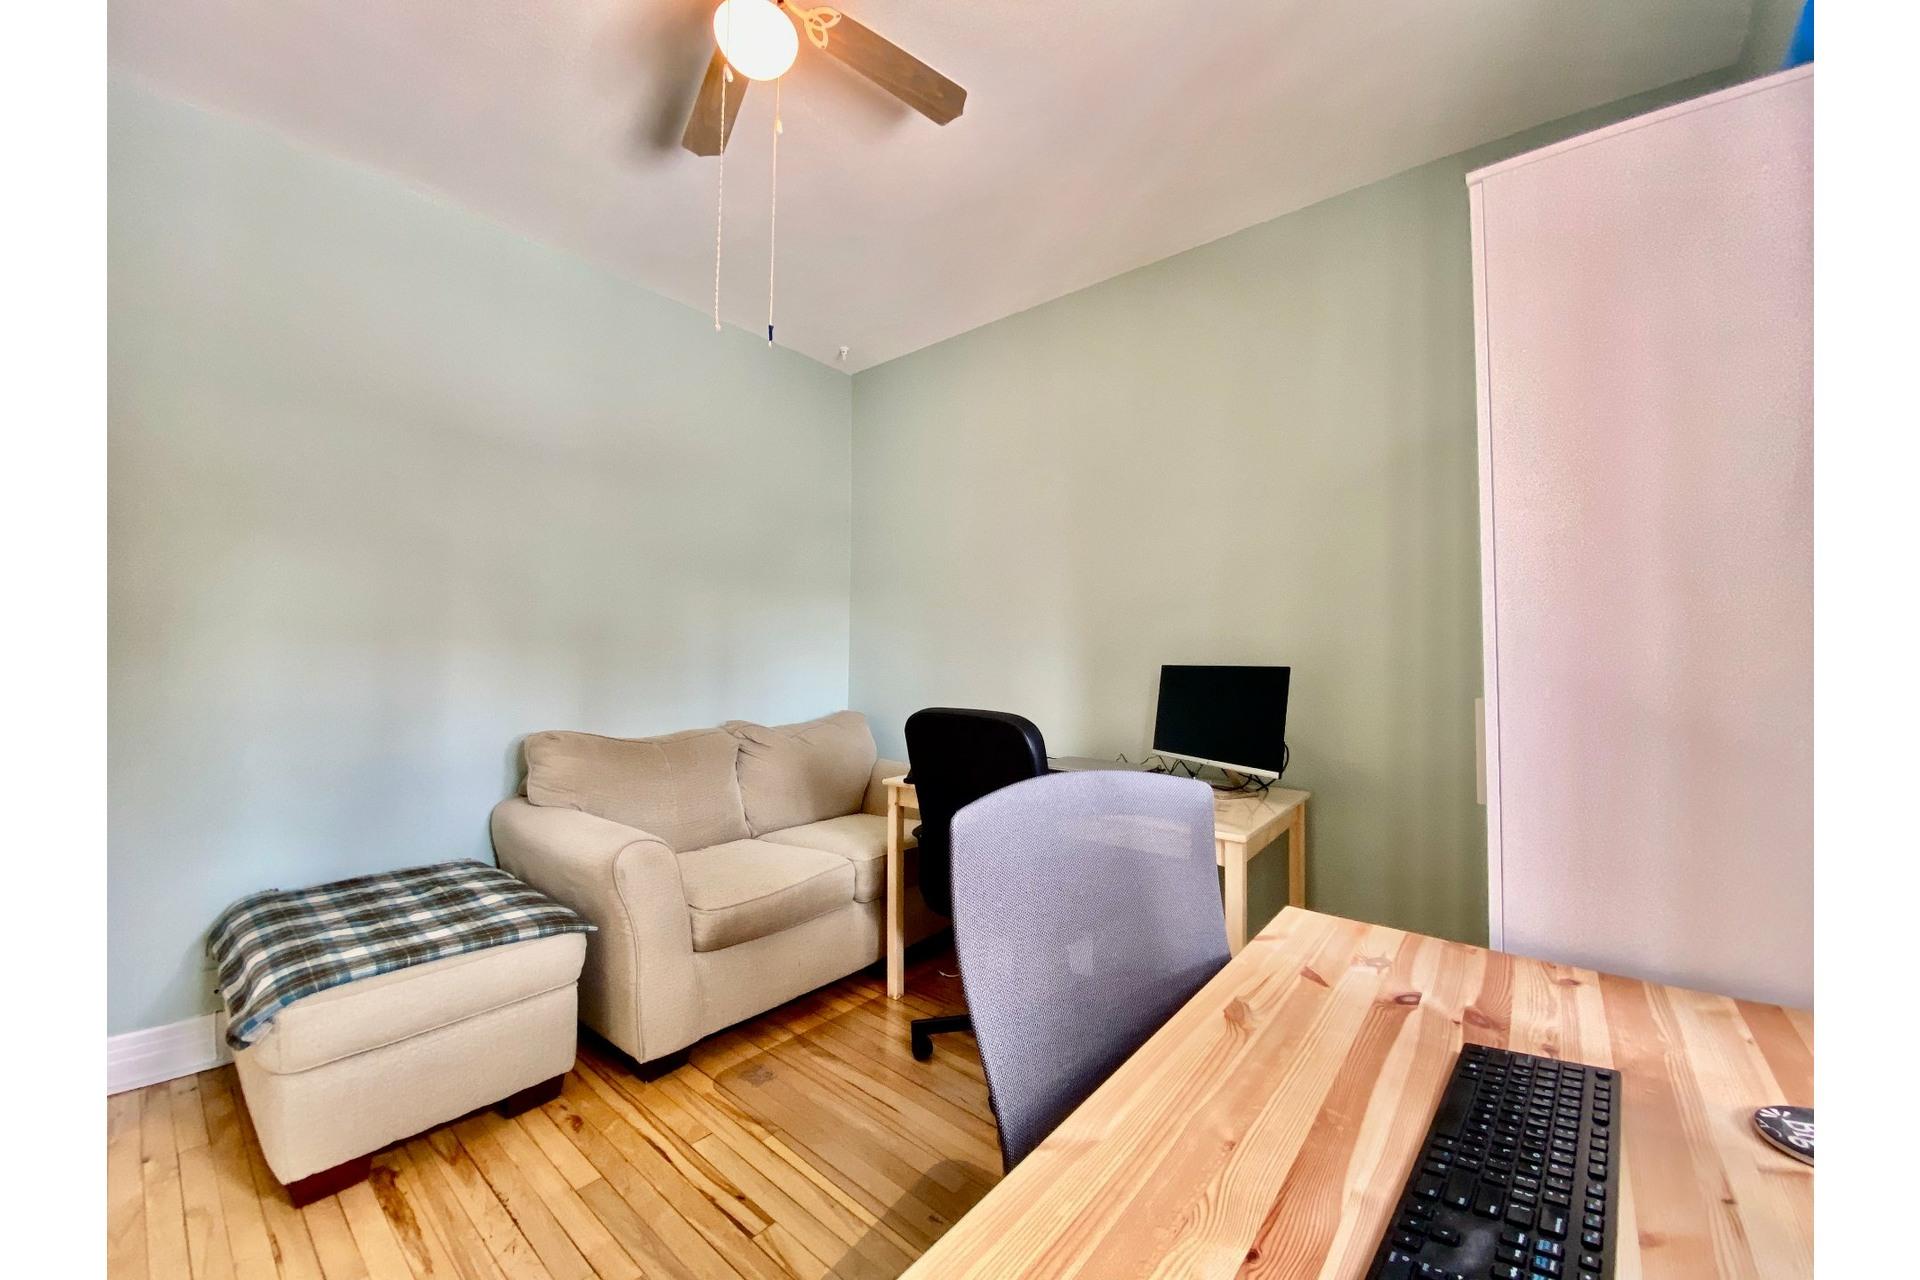 image 16 - Duplex En venta Lachine Montréal  - 6 habitaciones